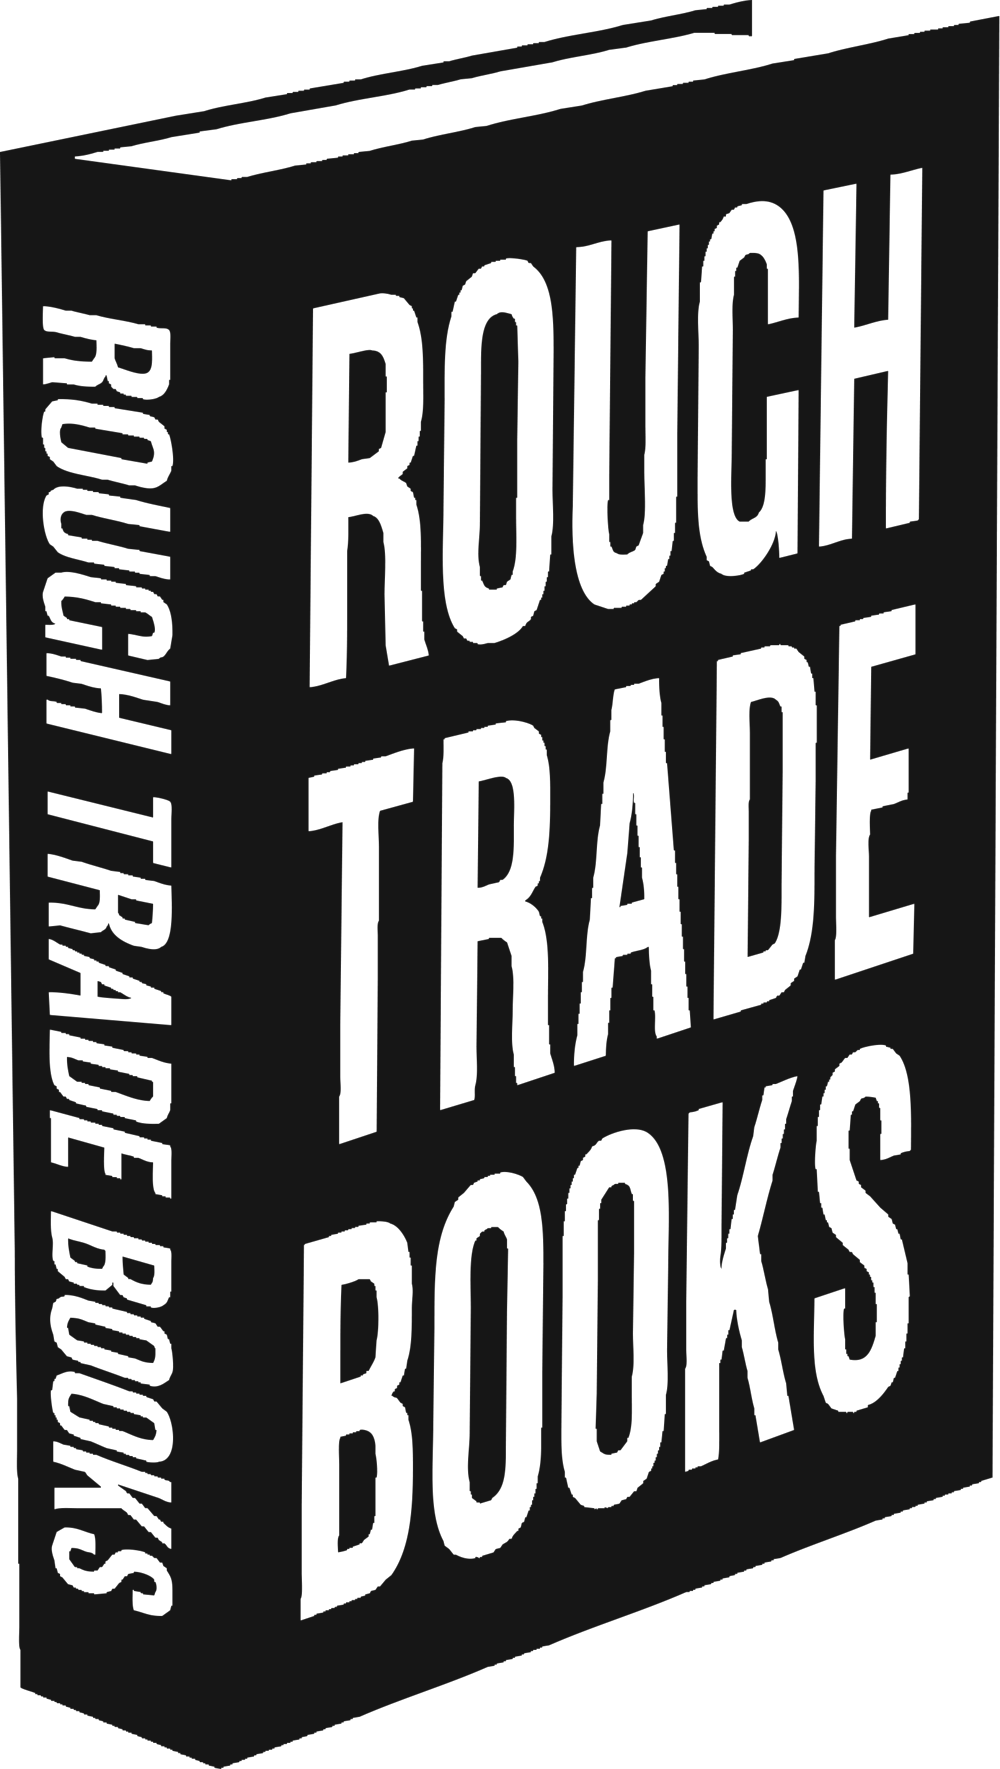 RTB_Book_Stood_BLACK_Transparent.png